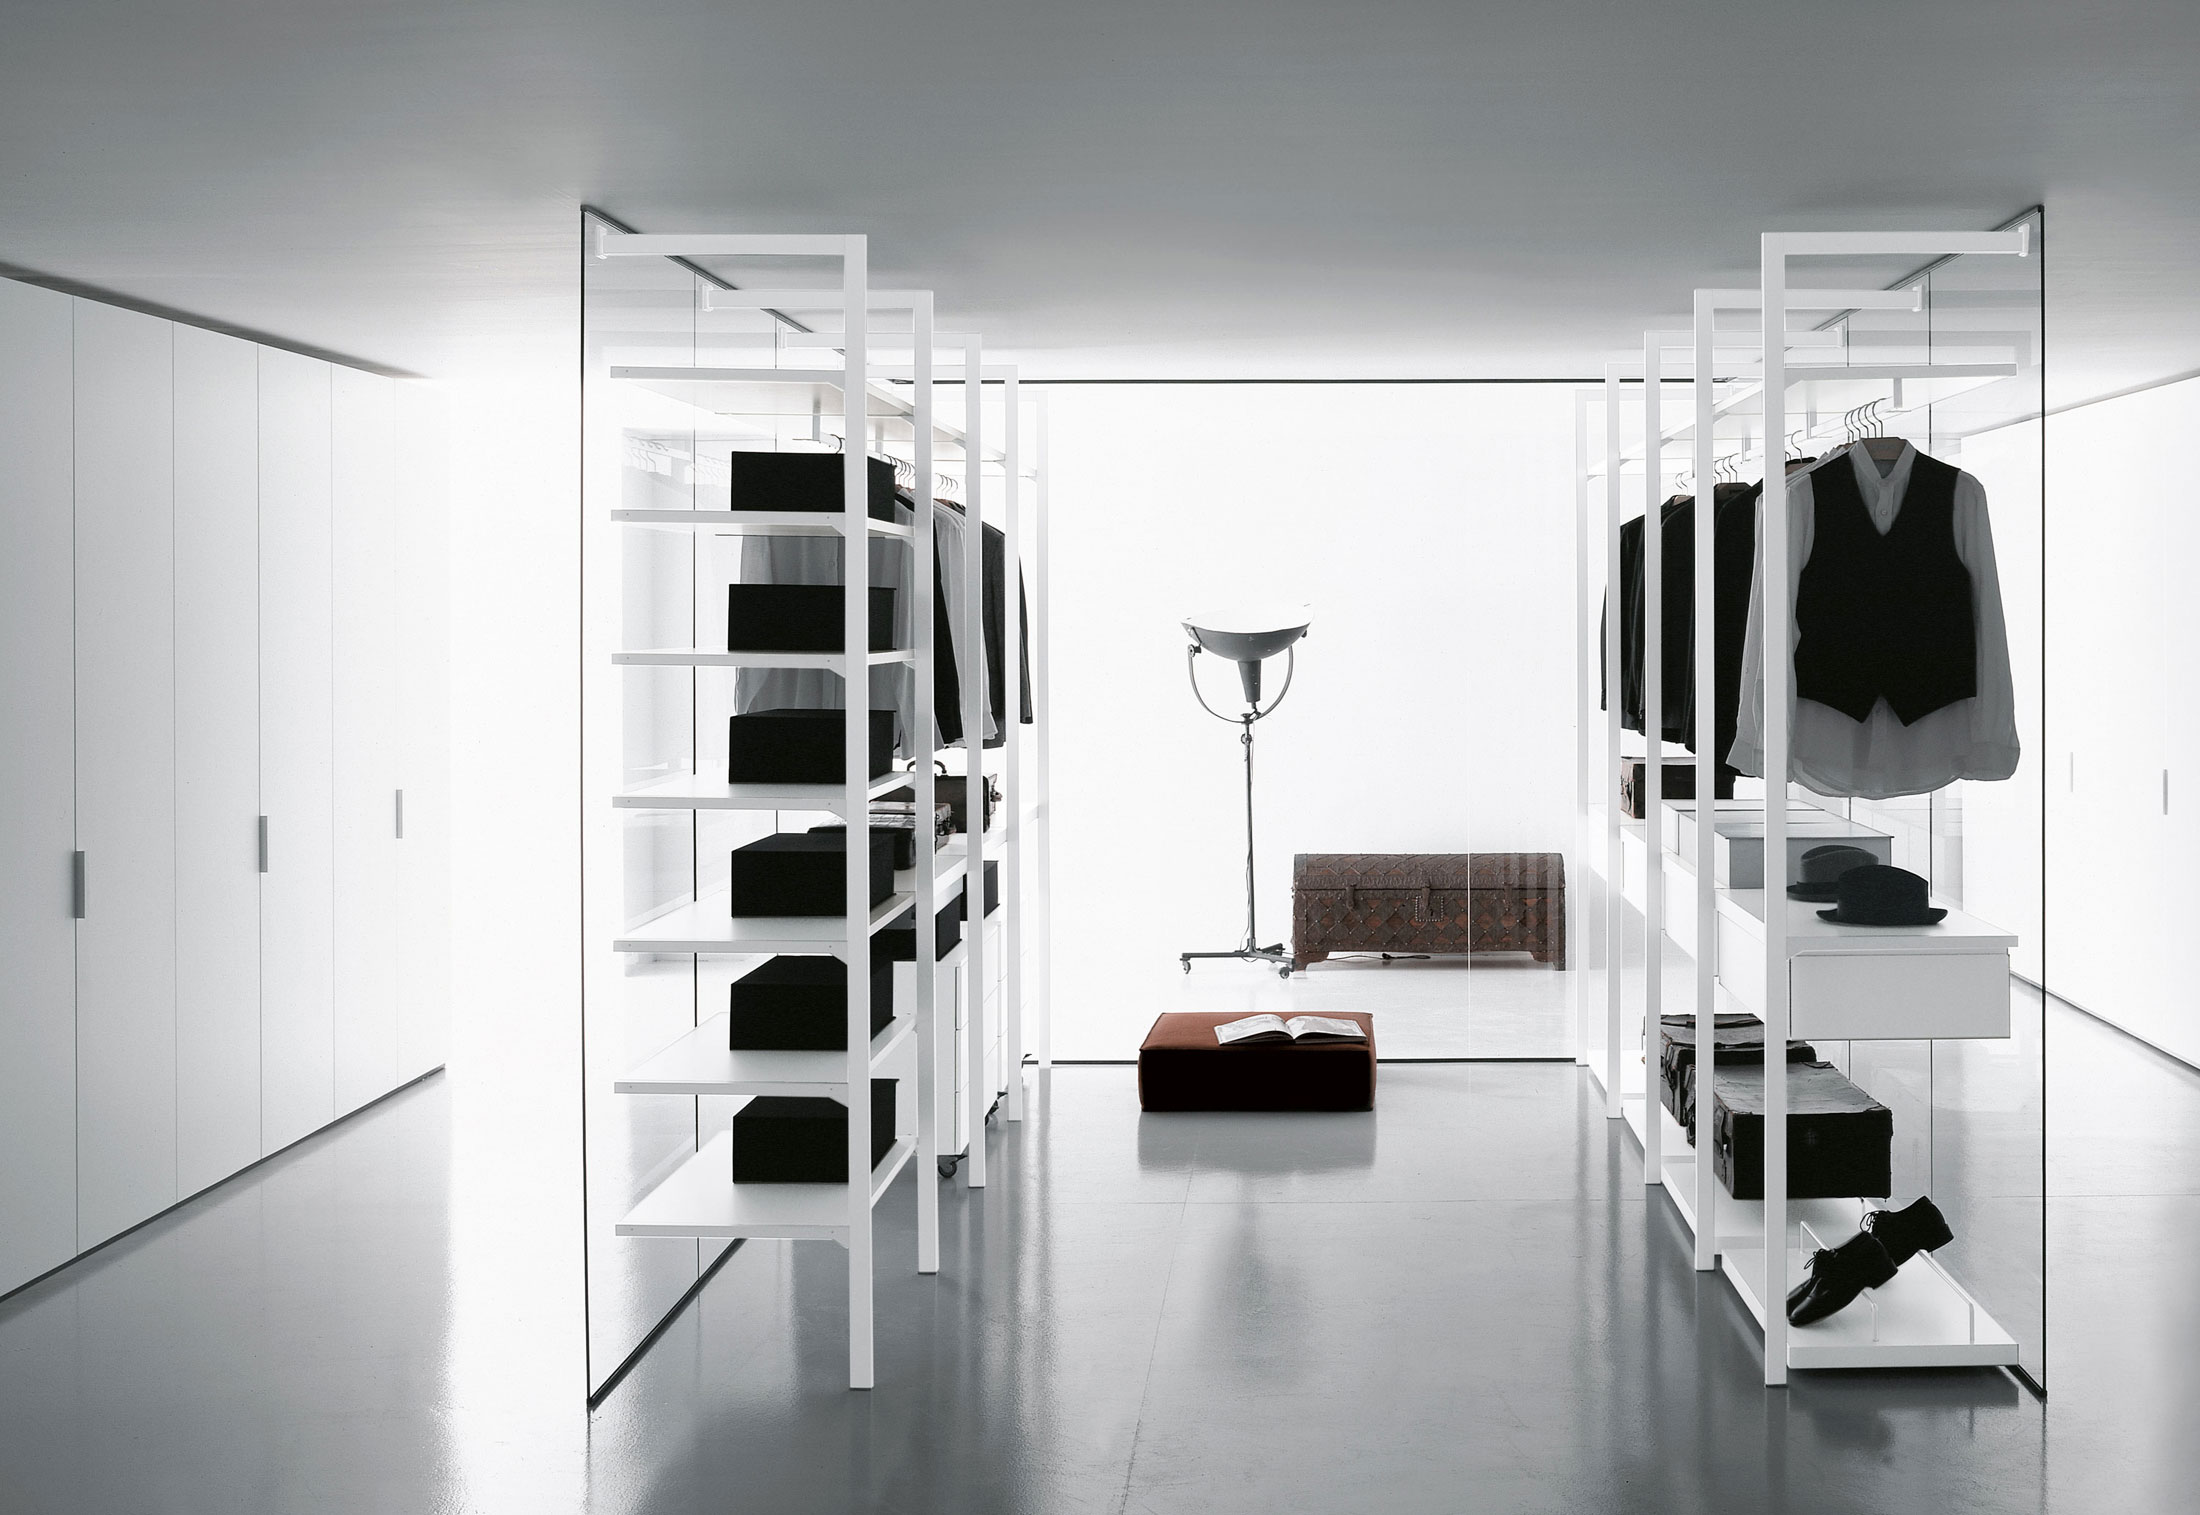 Cabina Armadio Walk In Closets : Storage cabina armadio walk in closet by porro stylepark